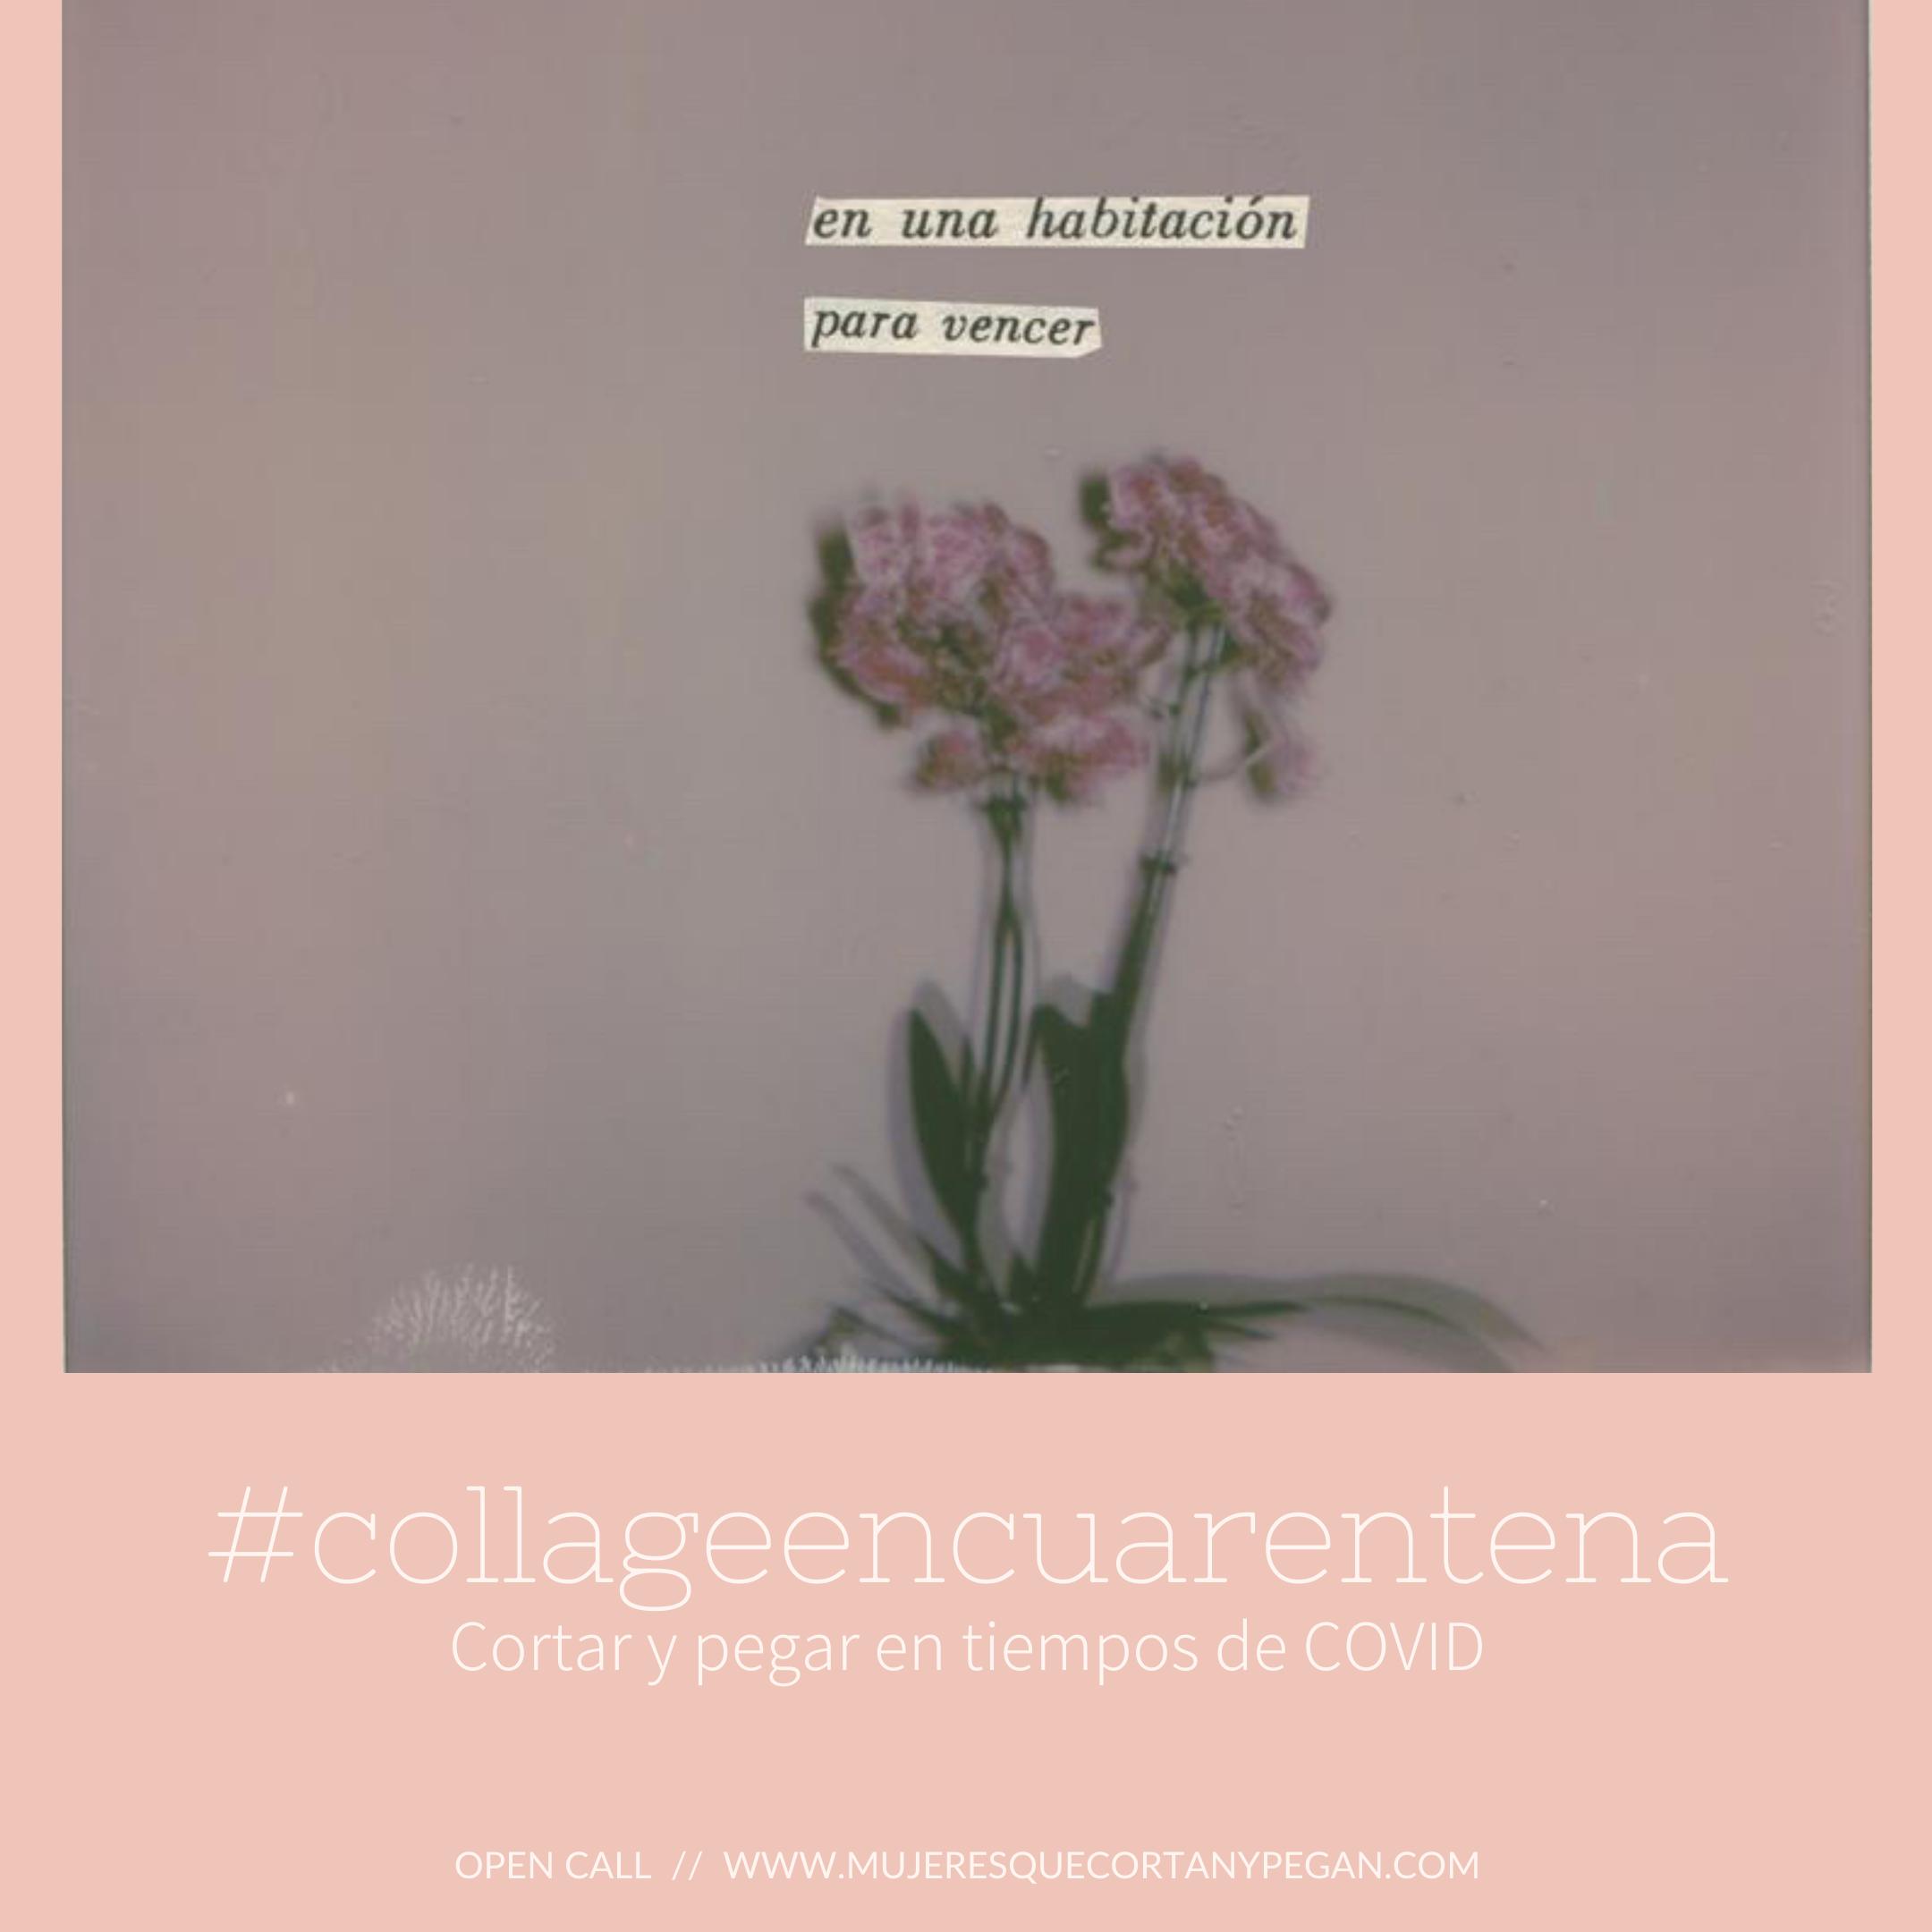 Convocatoria abierta / Open Call – #collageencuarentena